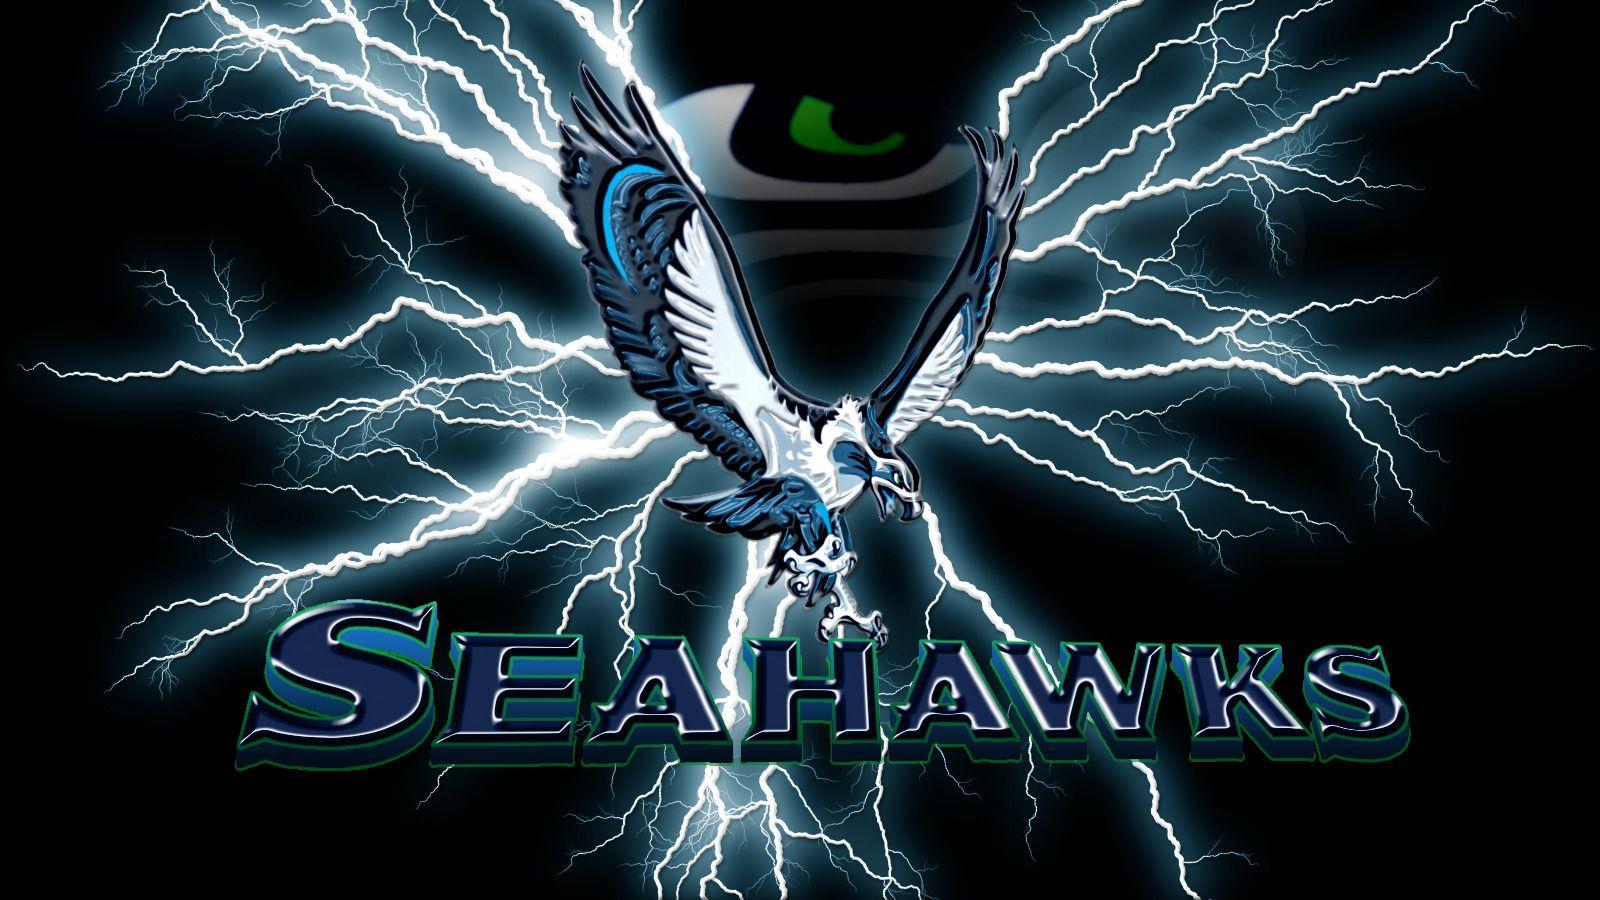 Seahawk Wallpaper Graphics and Web Design